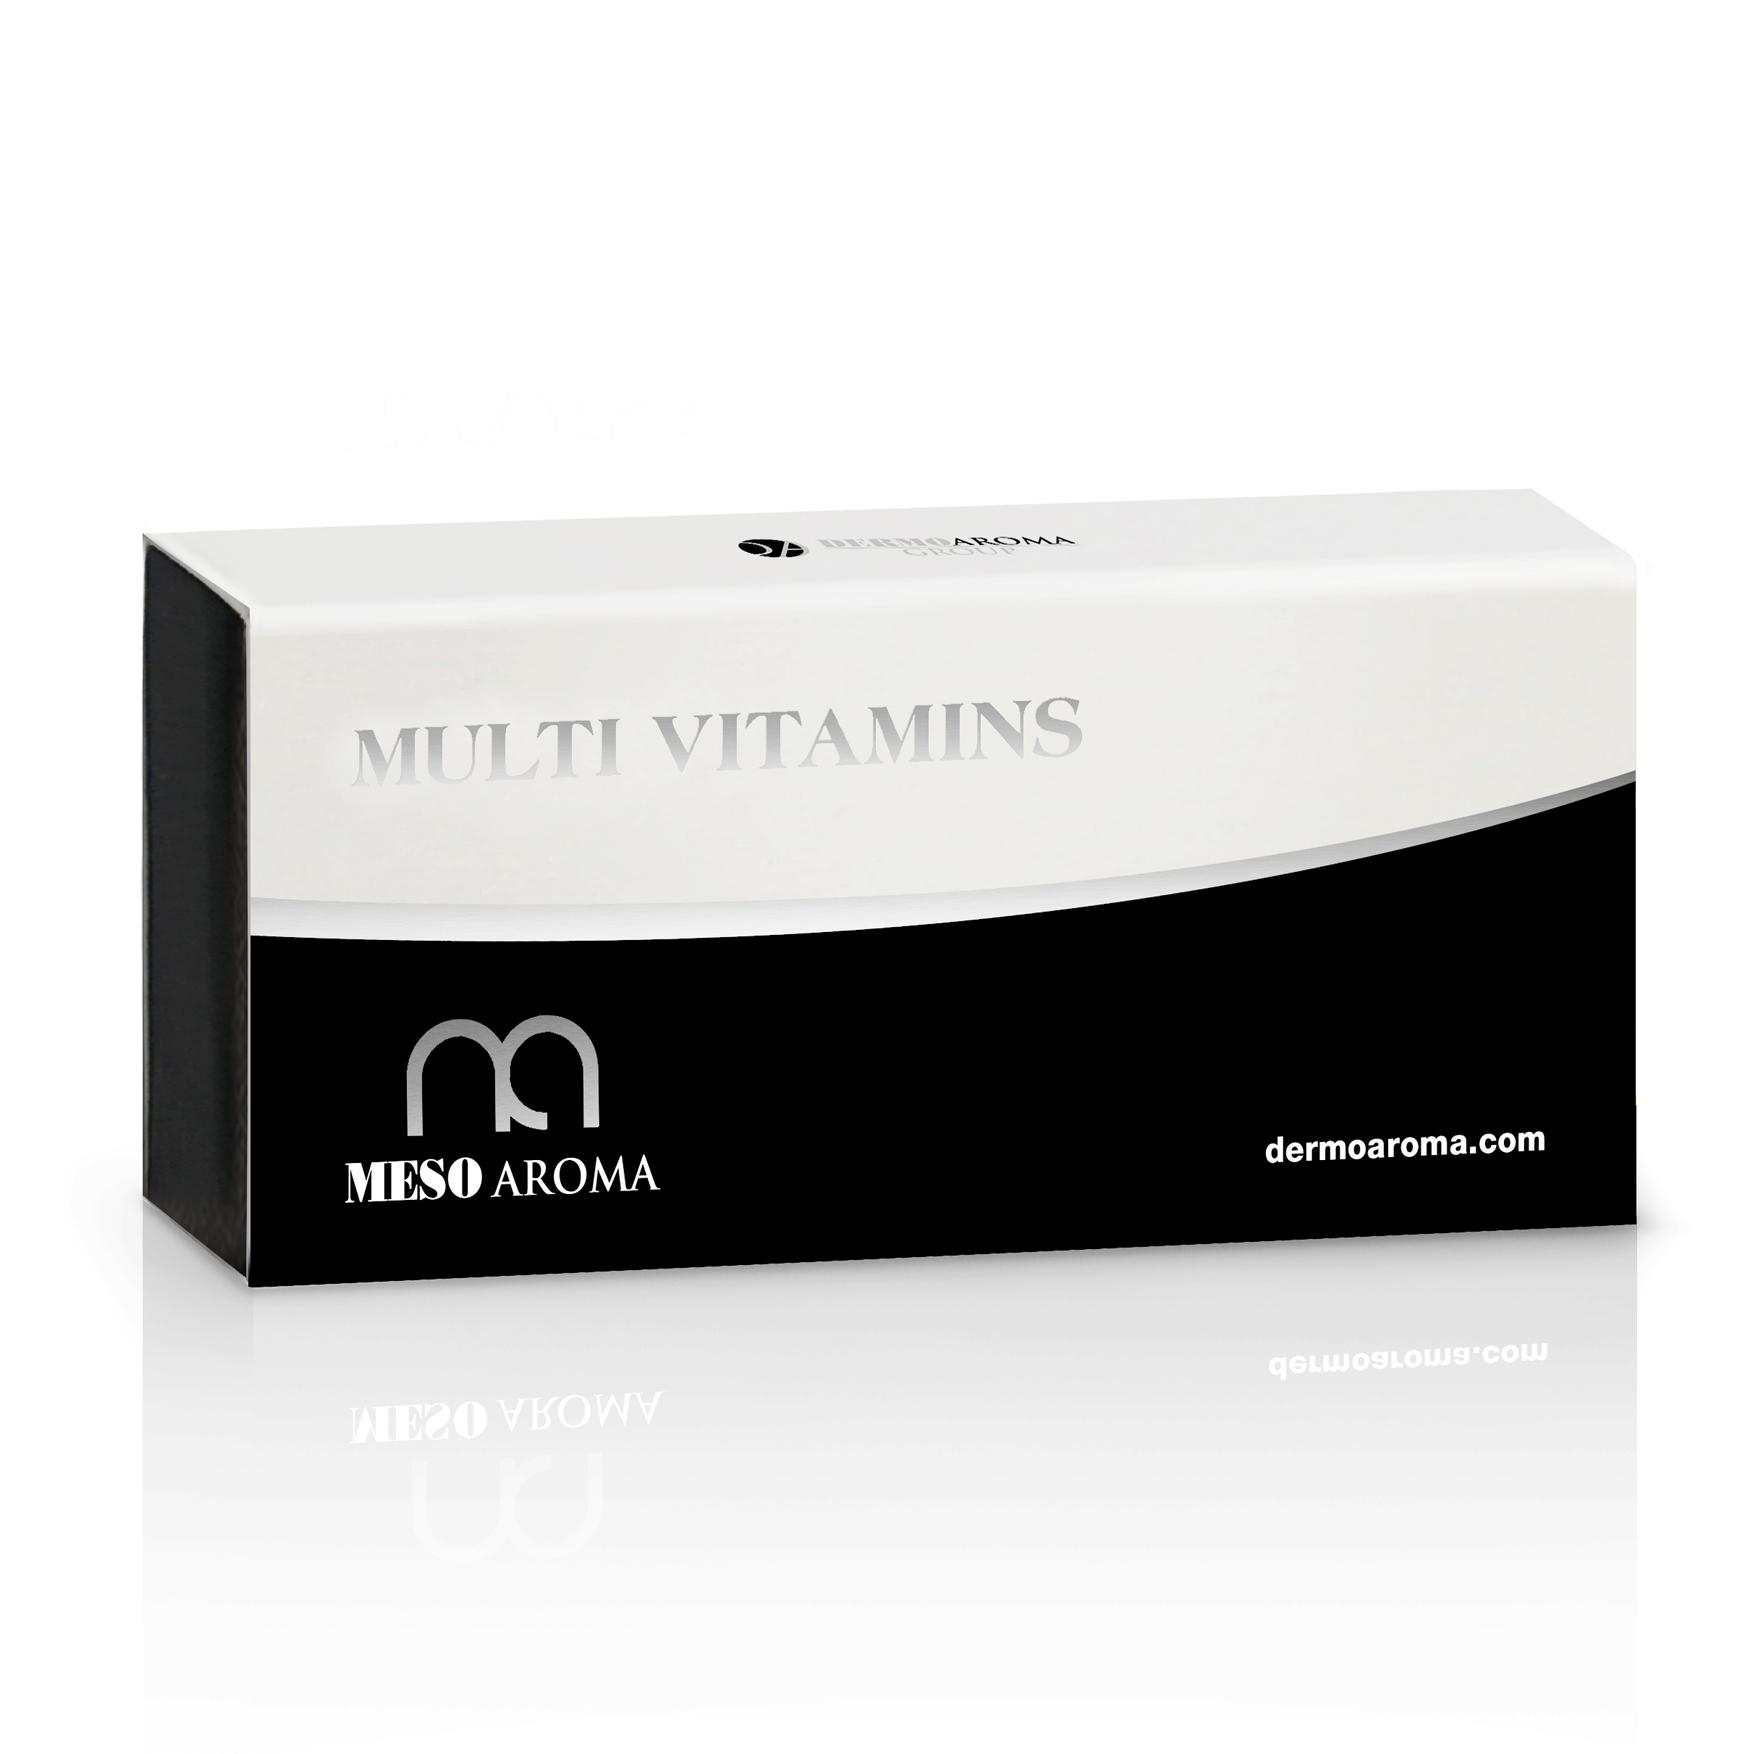 Mesoaroma-ampułki-do-mezoterapii-MULTI-VITAMINS